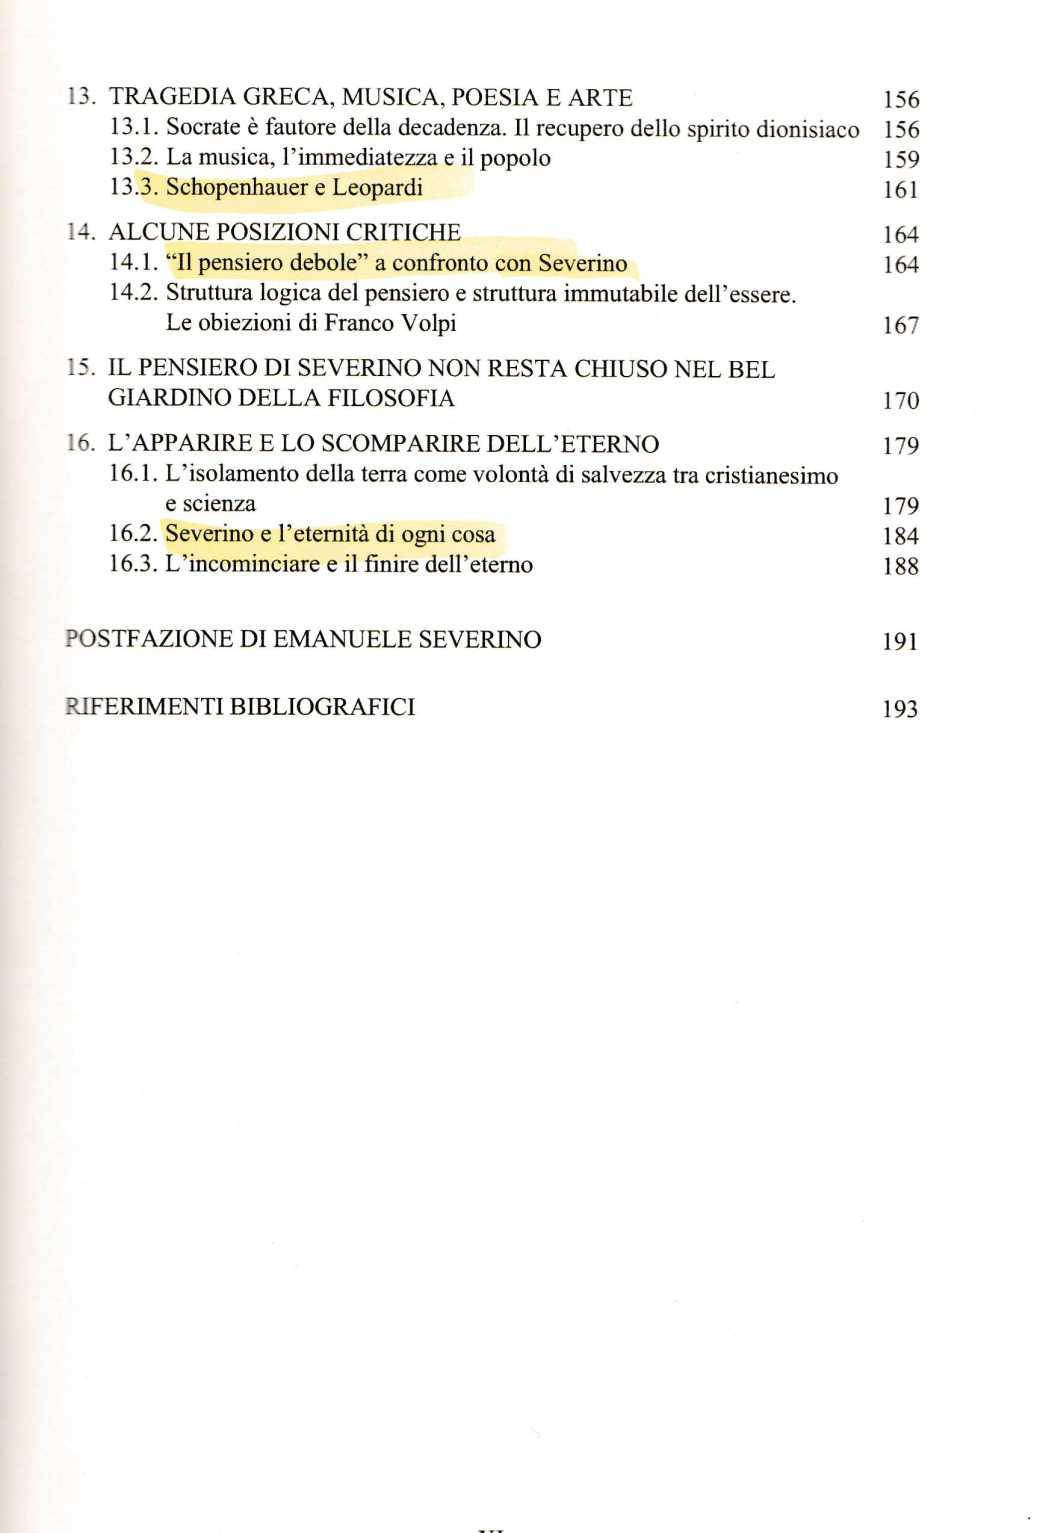 bosioleopardiseverino4402